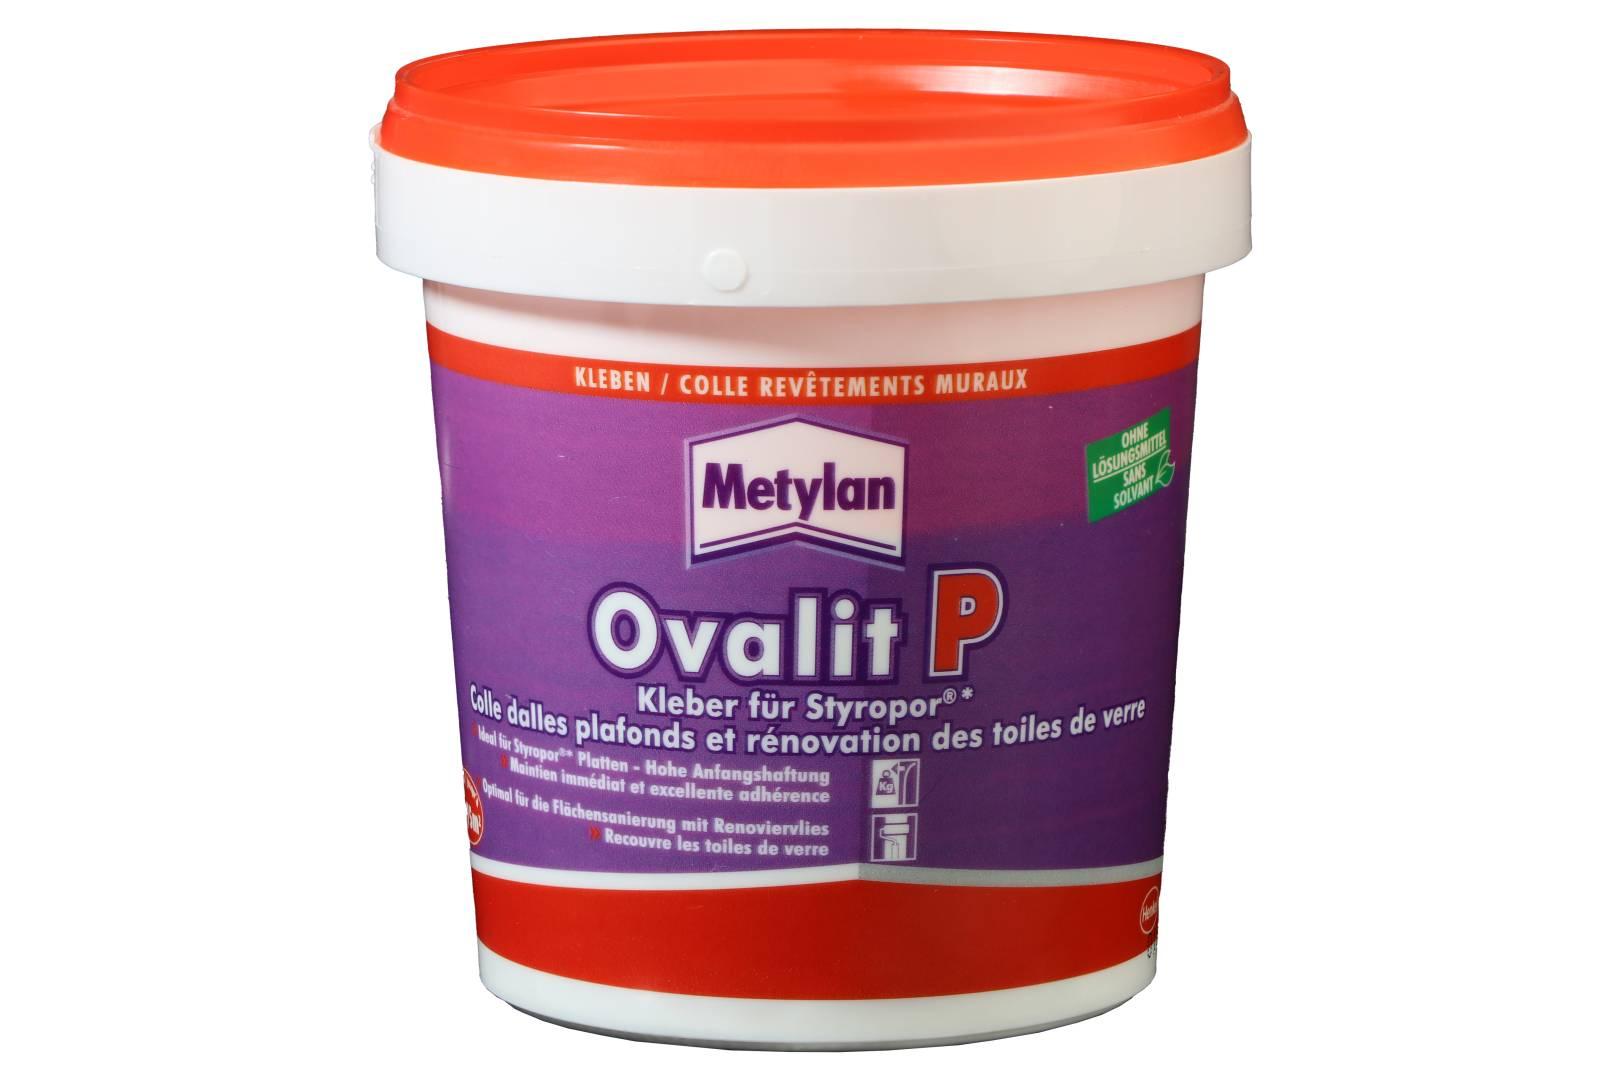 Metylan Ovalit P, Styroporkleber, 925 g